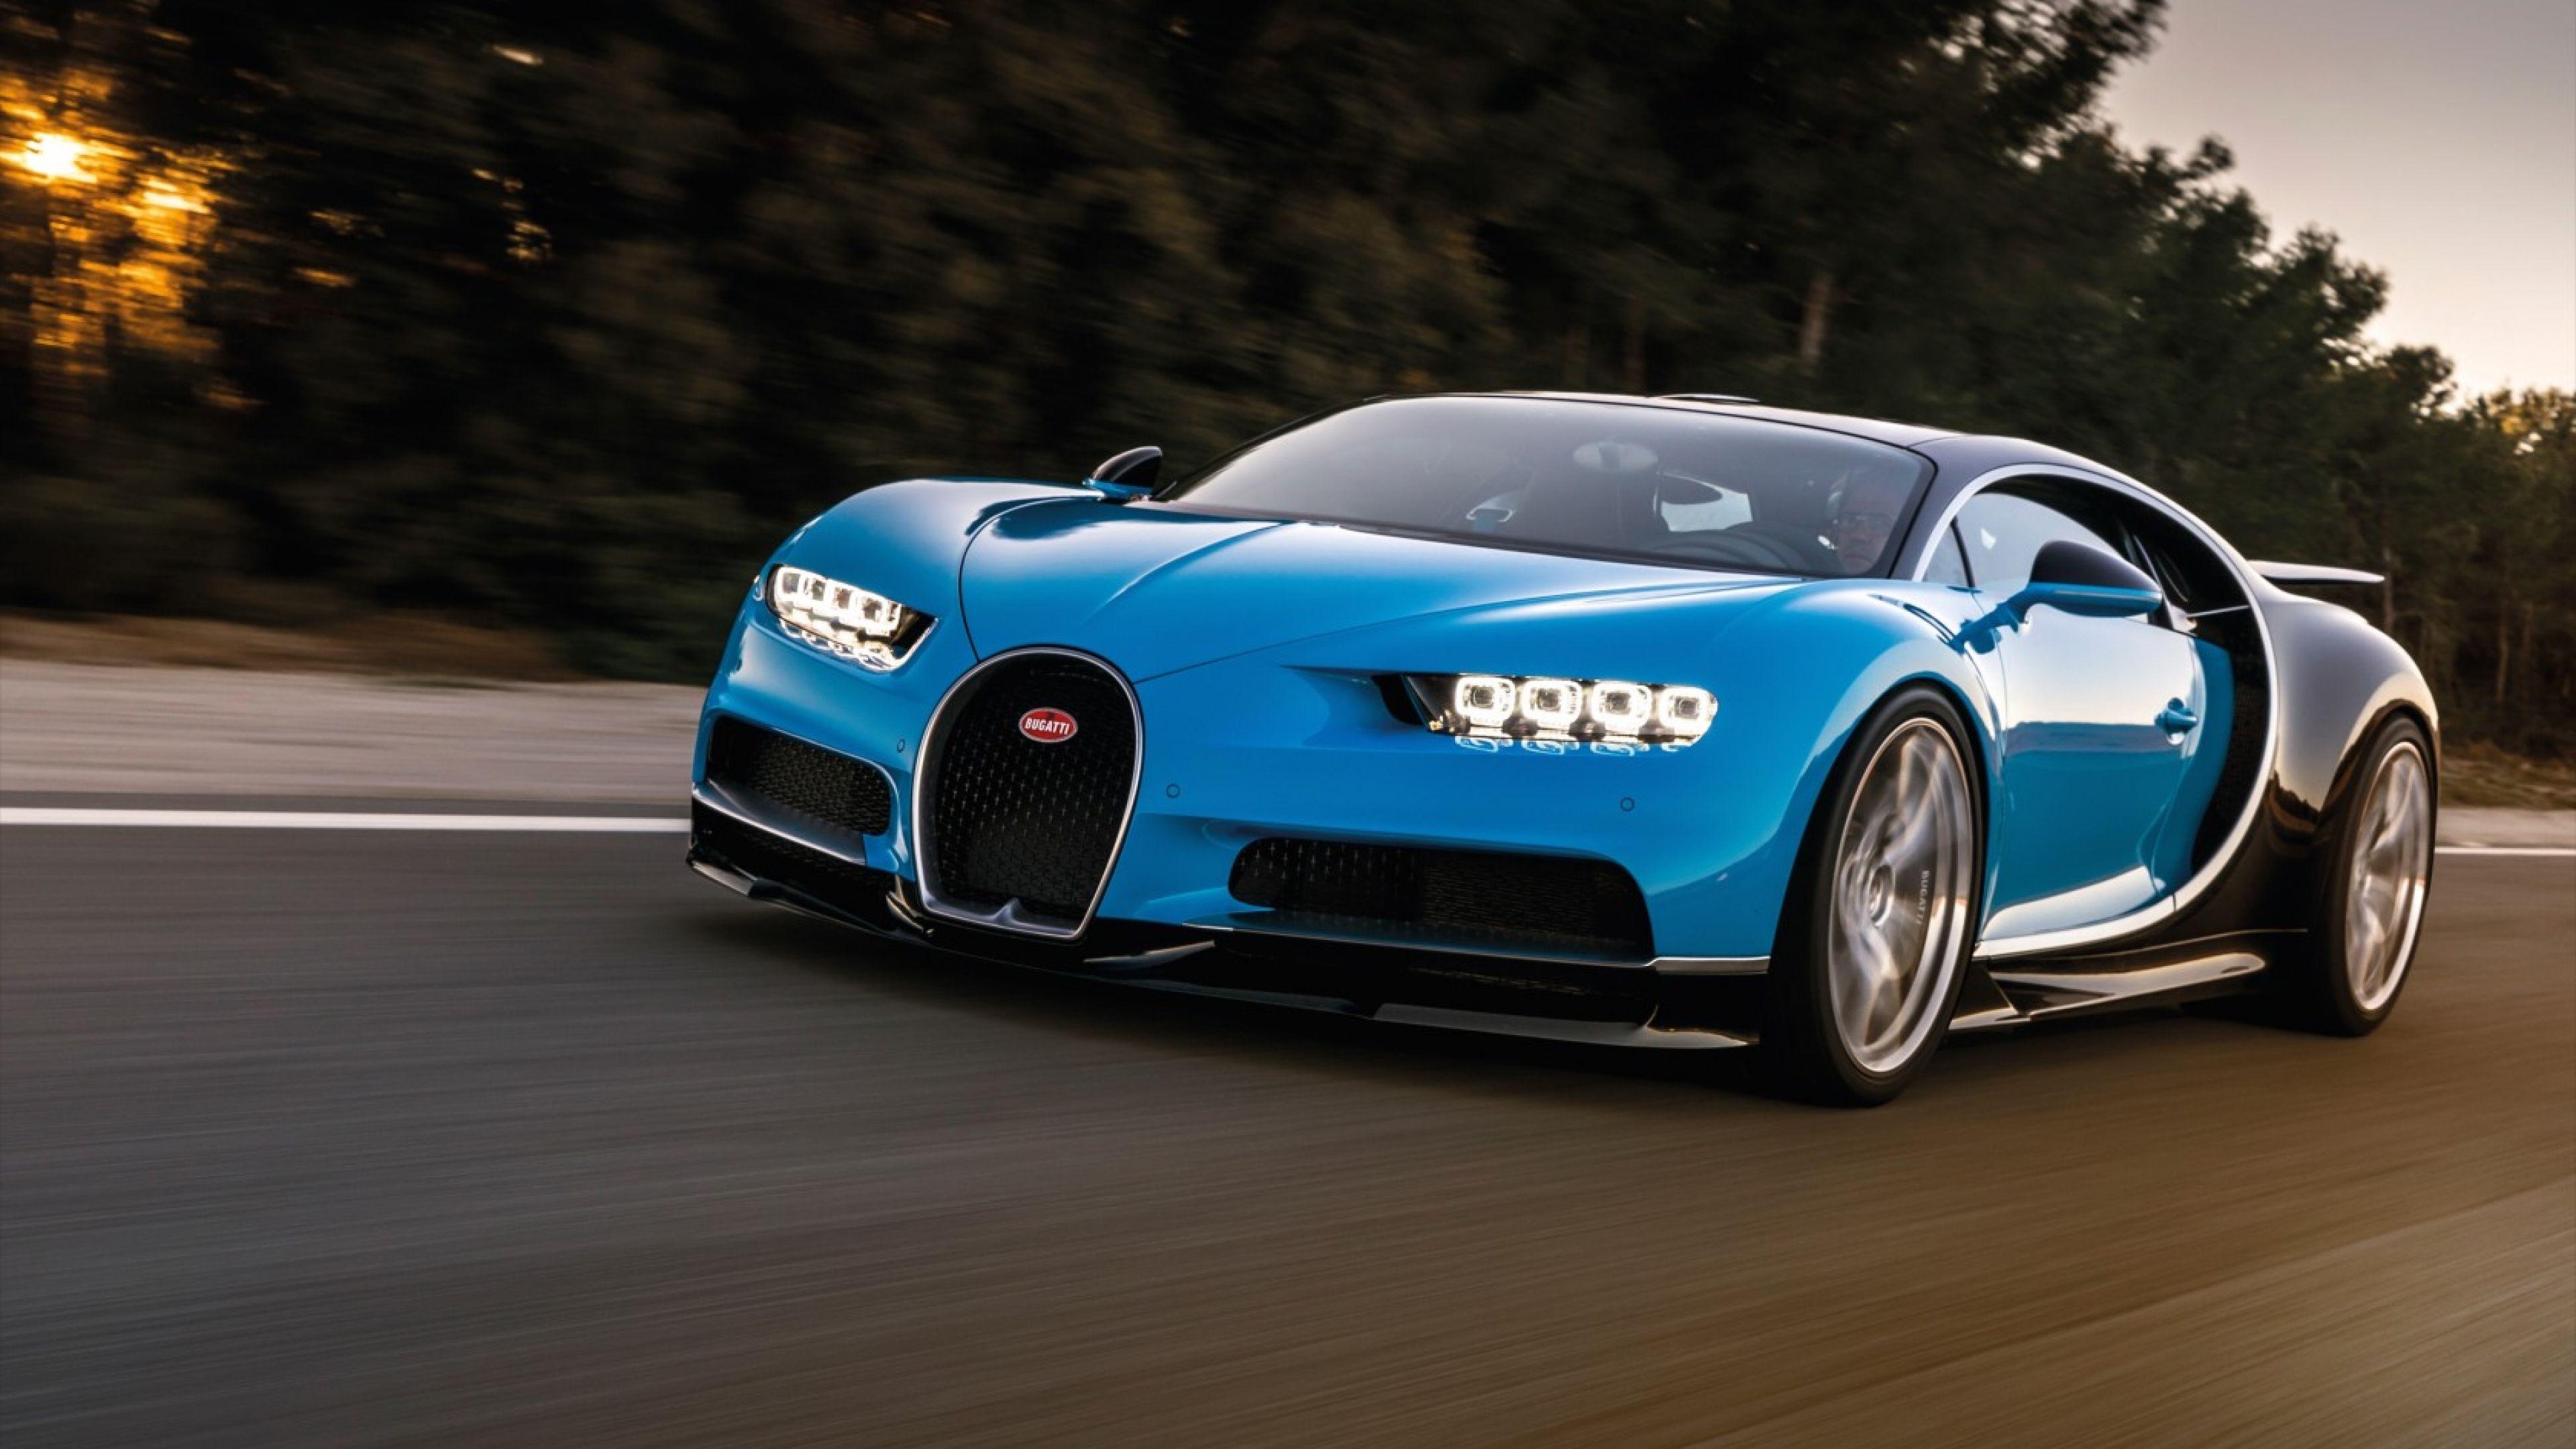 3840x2160 Wallpaper Bugatti Chiron Blue Side View Bugatti